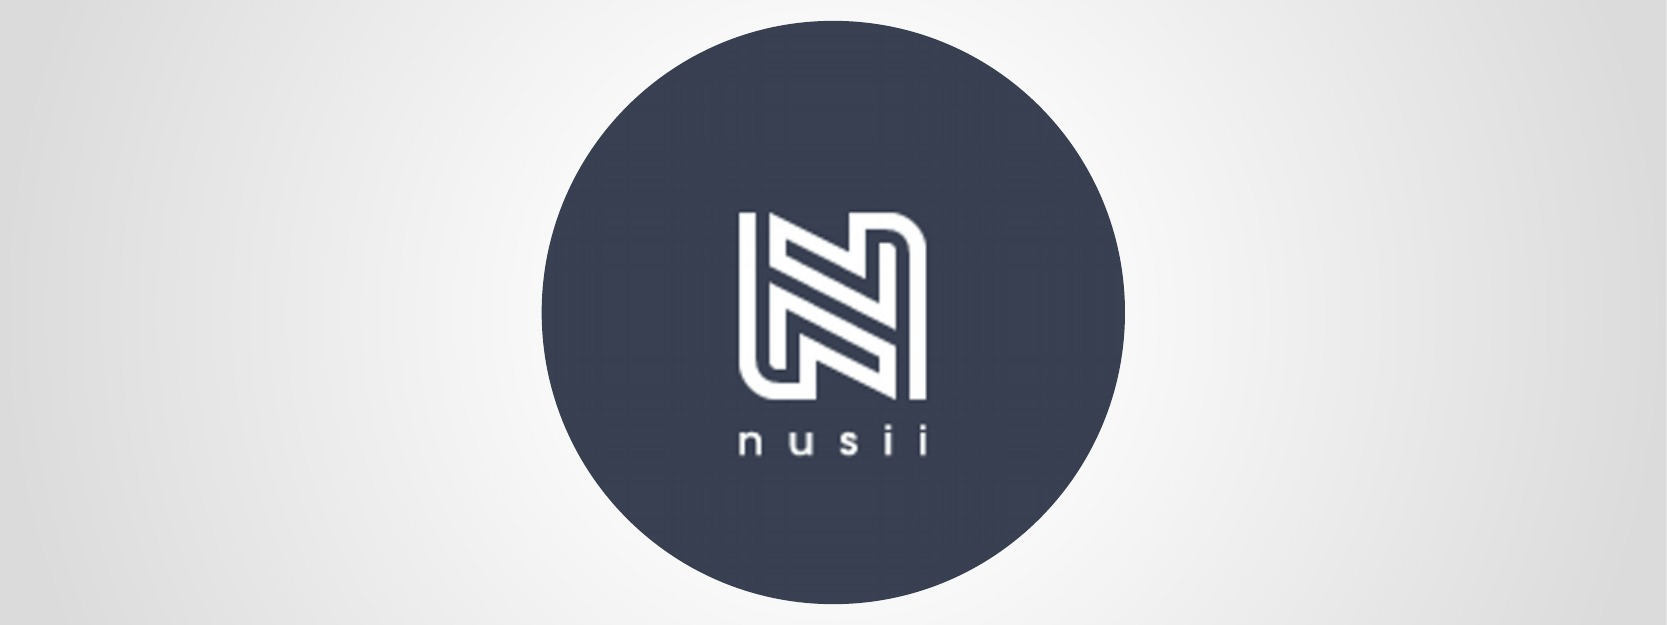 Nusii, proposal automation software